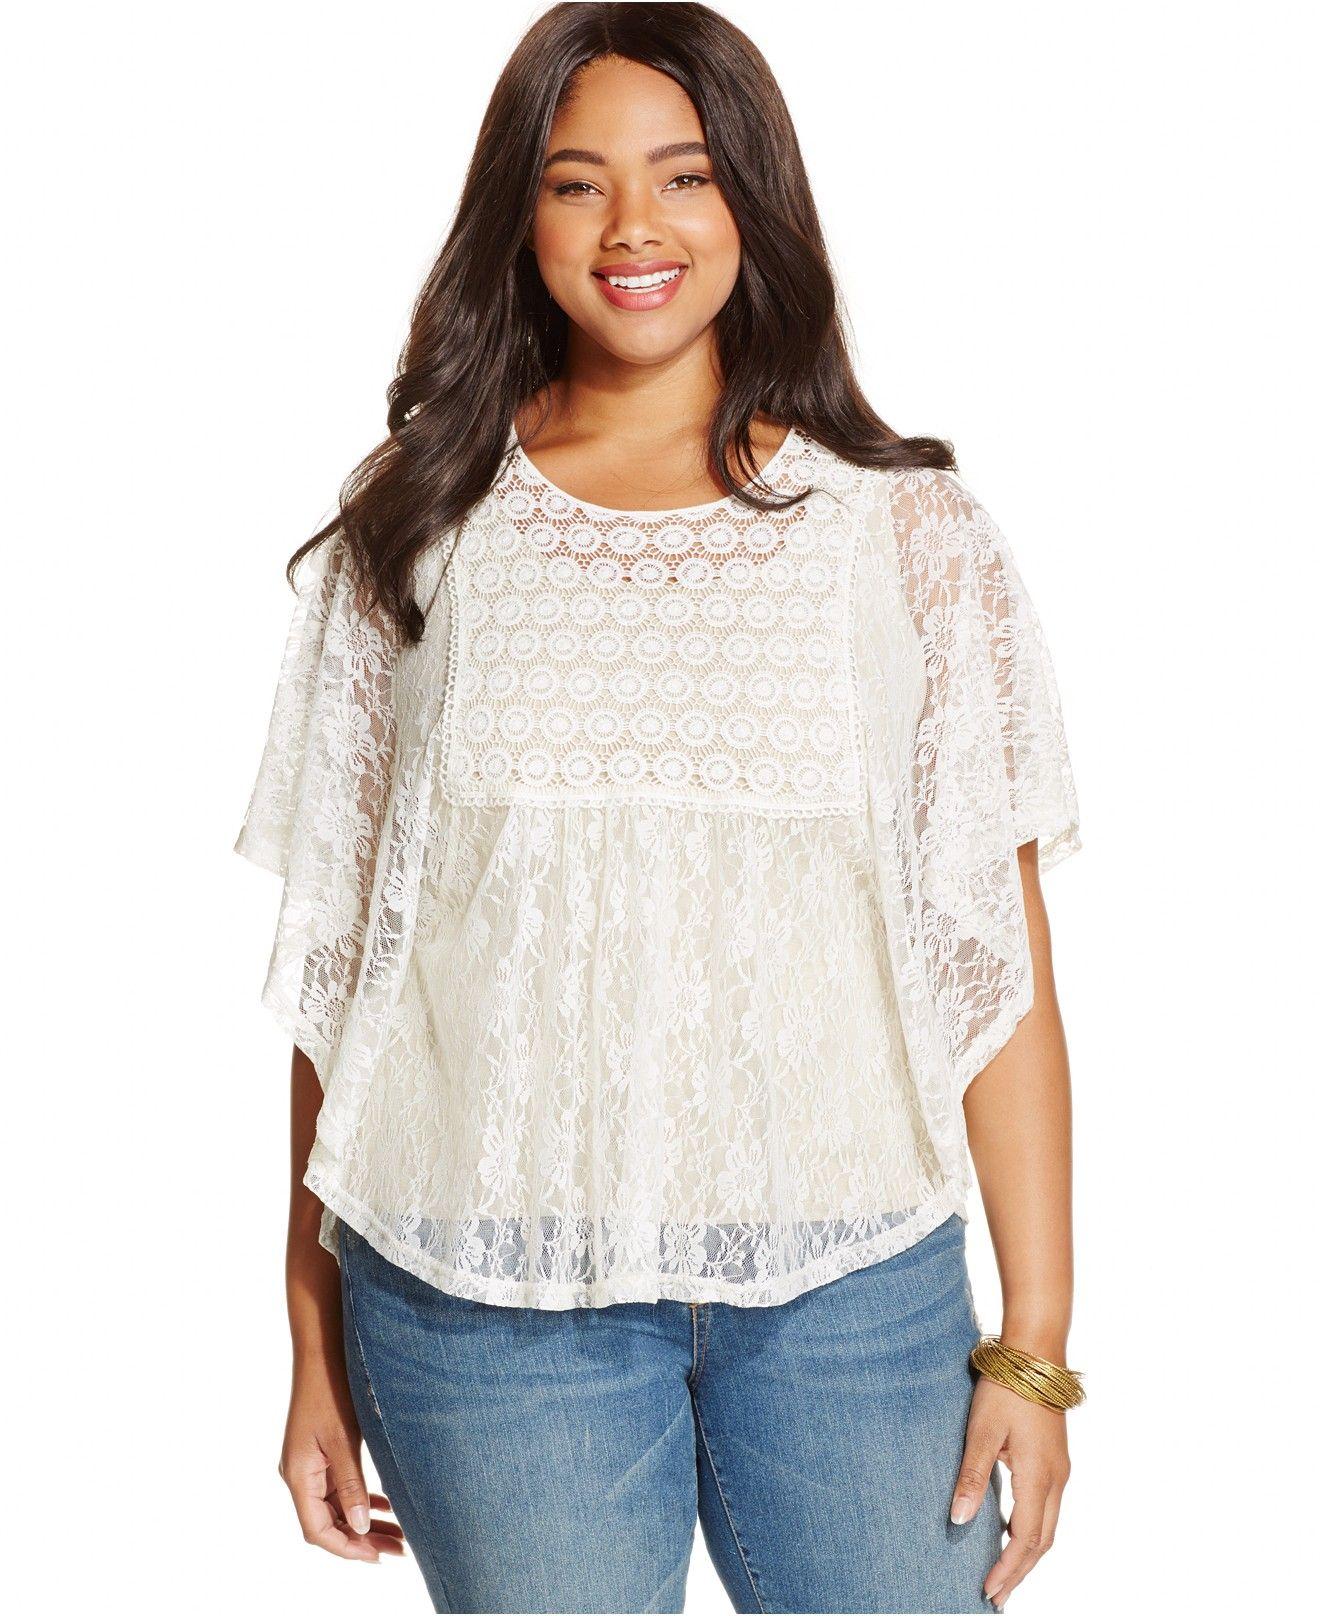 b8882ae049f72 Plus Size Cutout-Back Lace Poncho Top